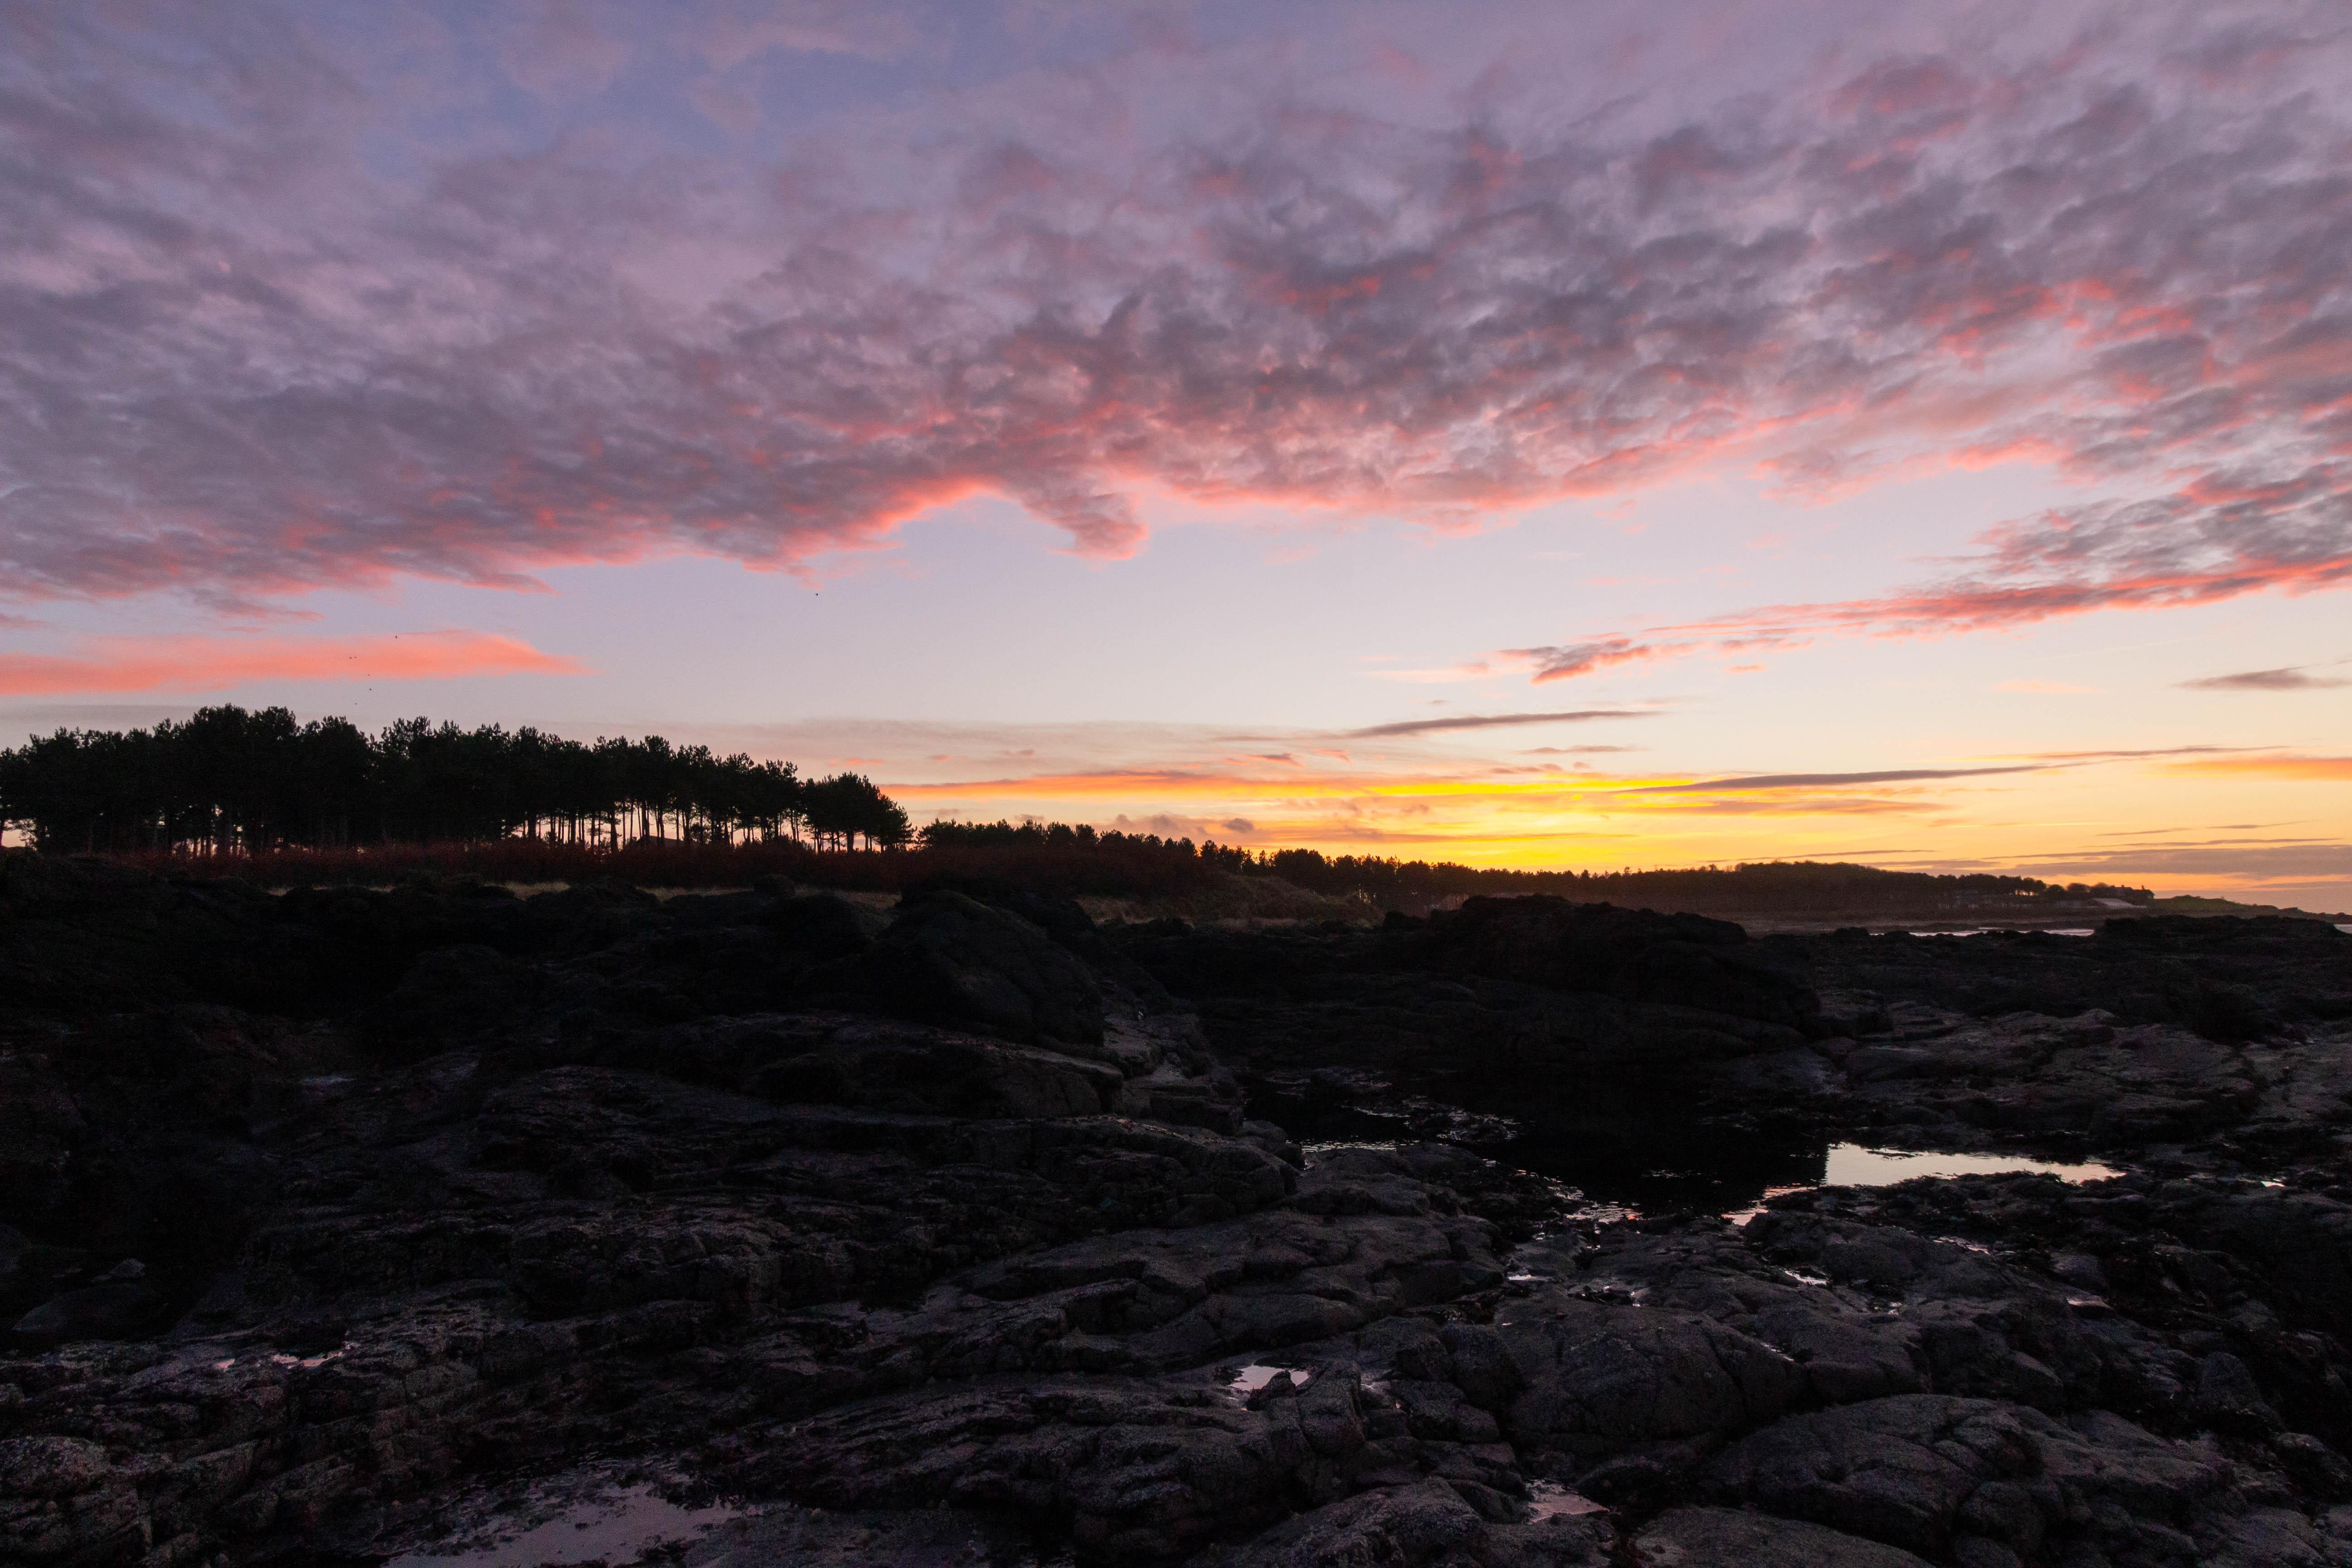 Beautiful orange, pink, and purple sunset at Yellowcraig Beach, East Lothian